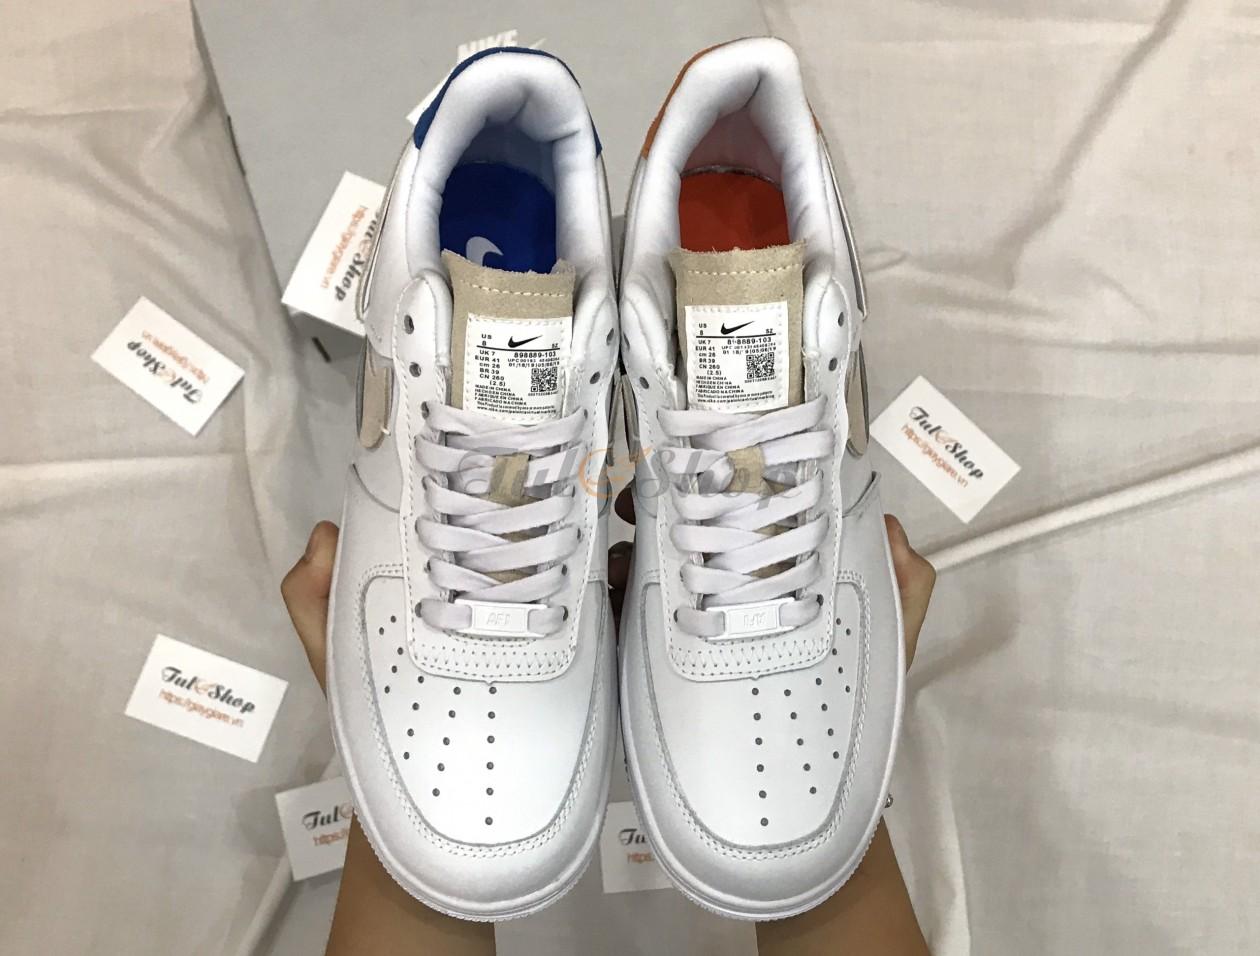 Nike Sportswear Air Force 1 07 Lux White/Platinum Tint